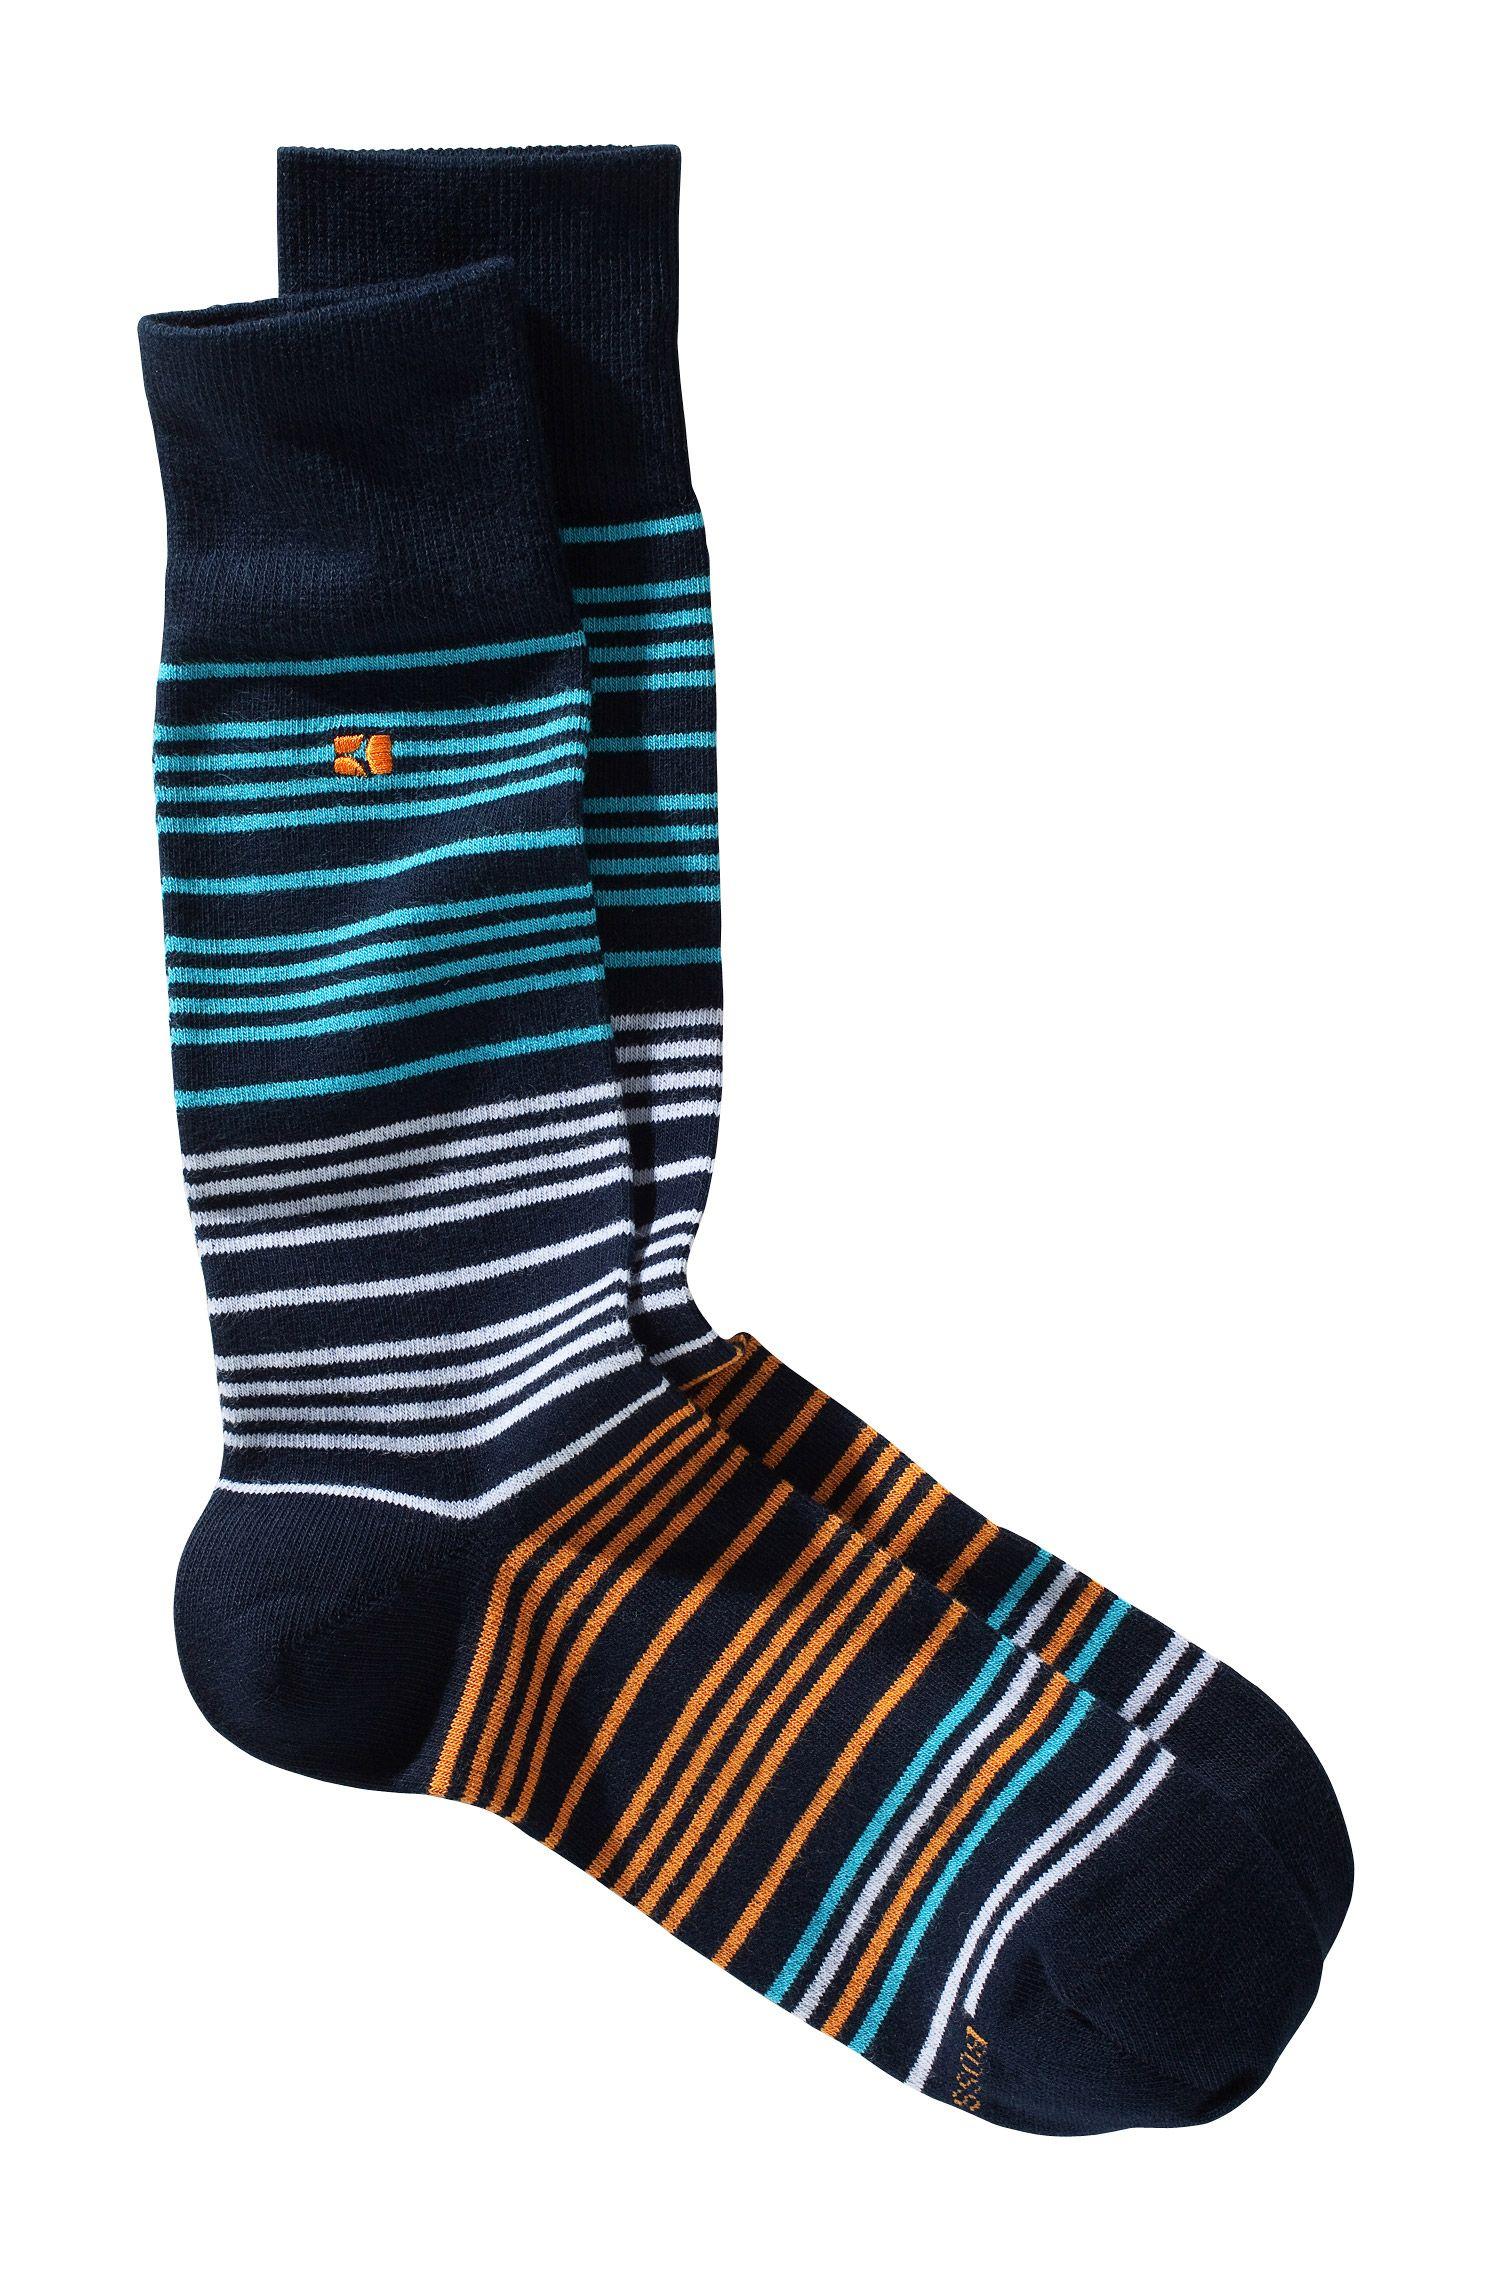 Chaussettes à rayures, RS Design